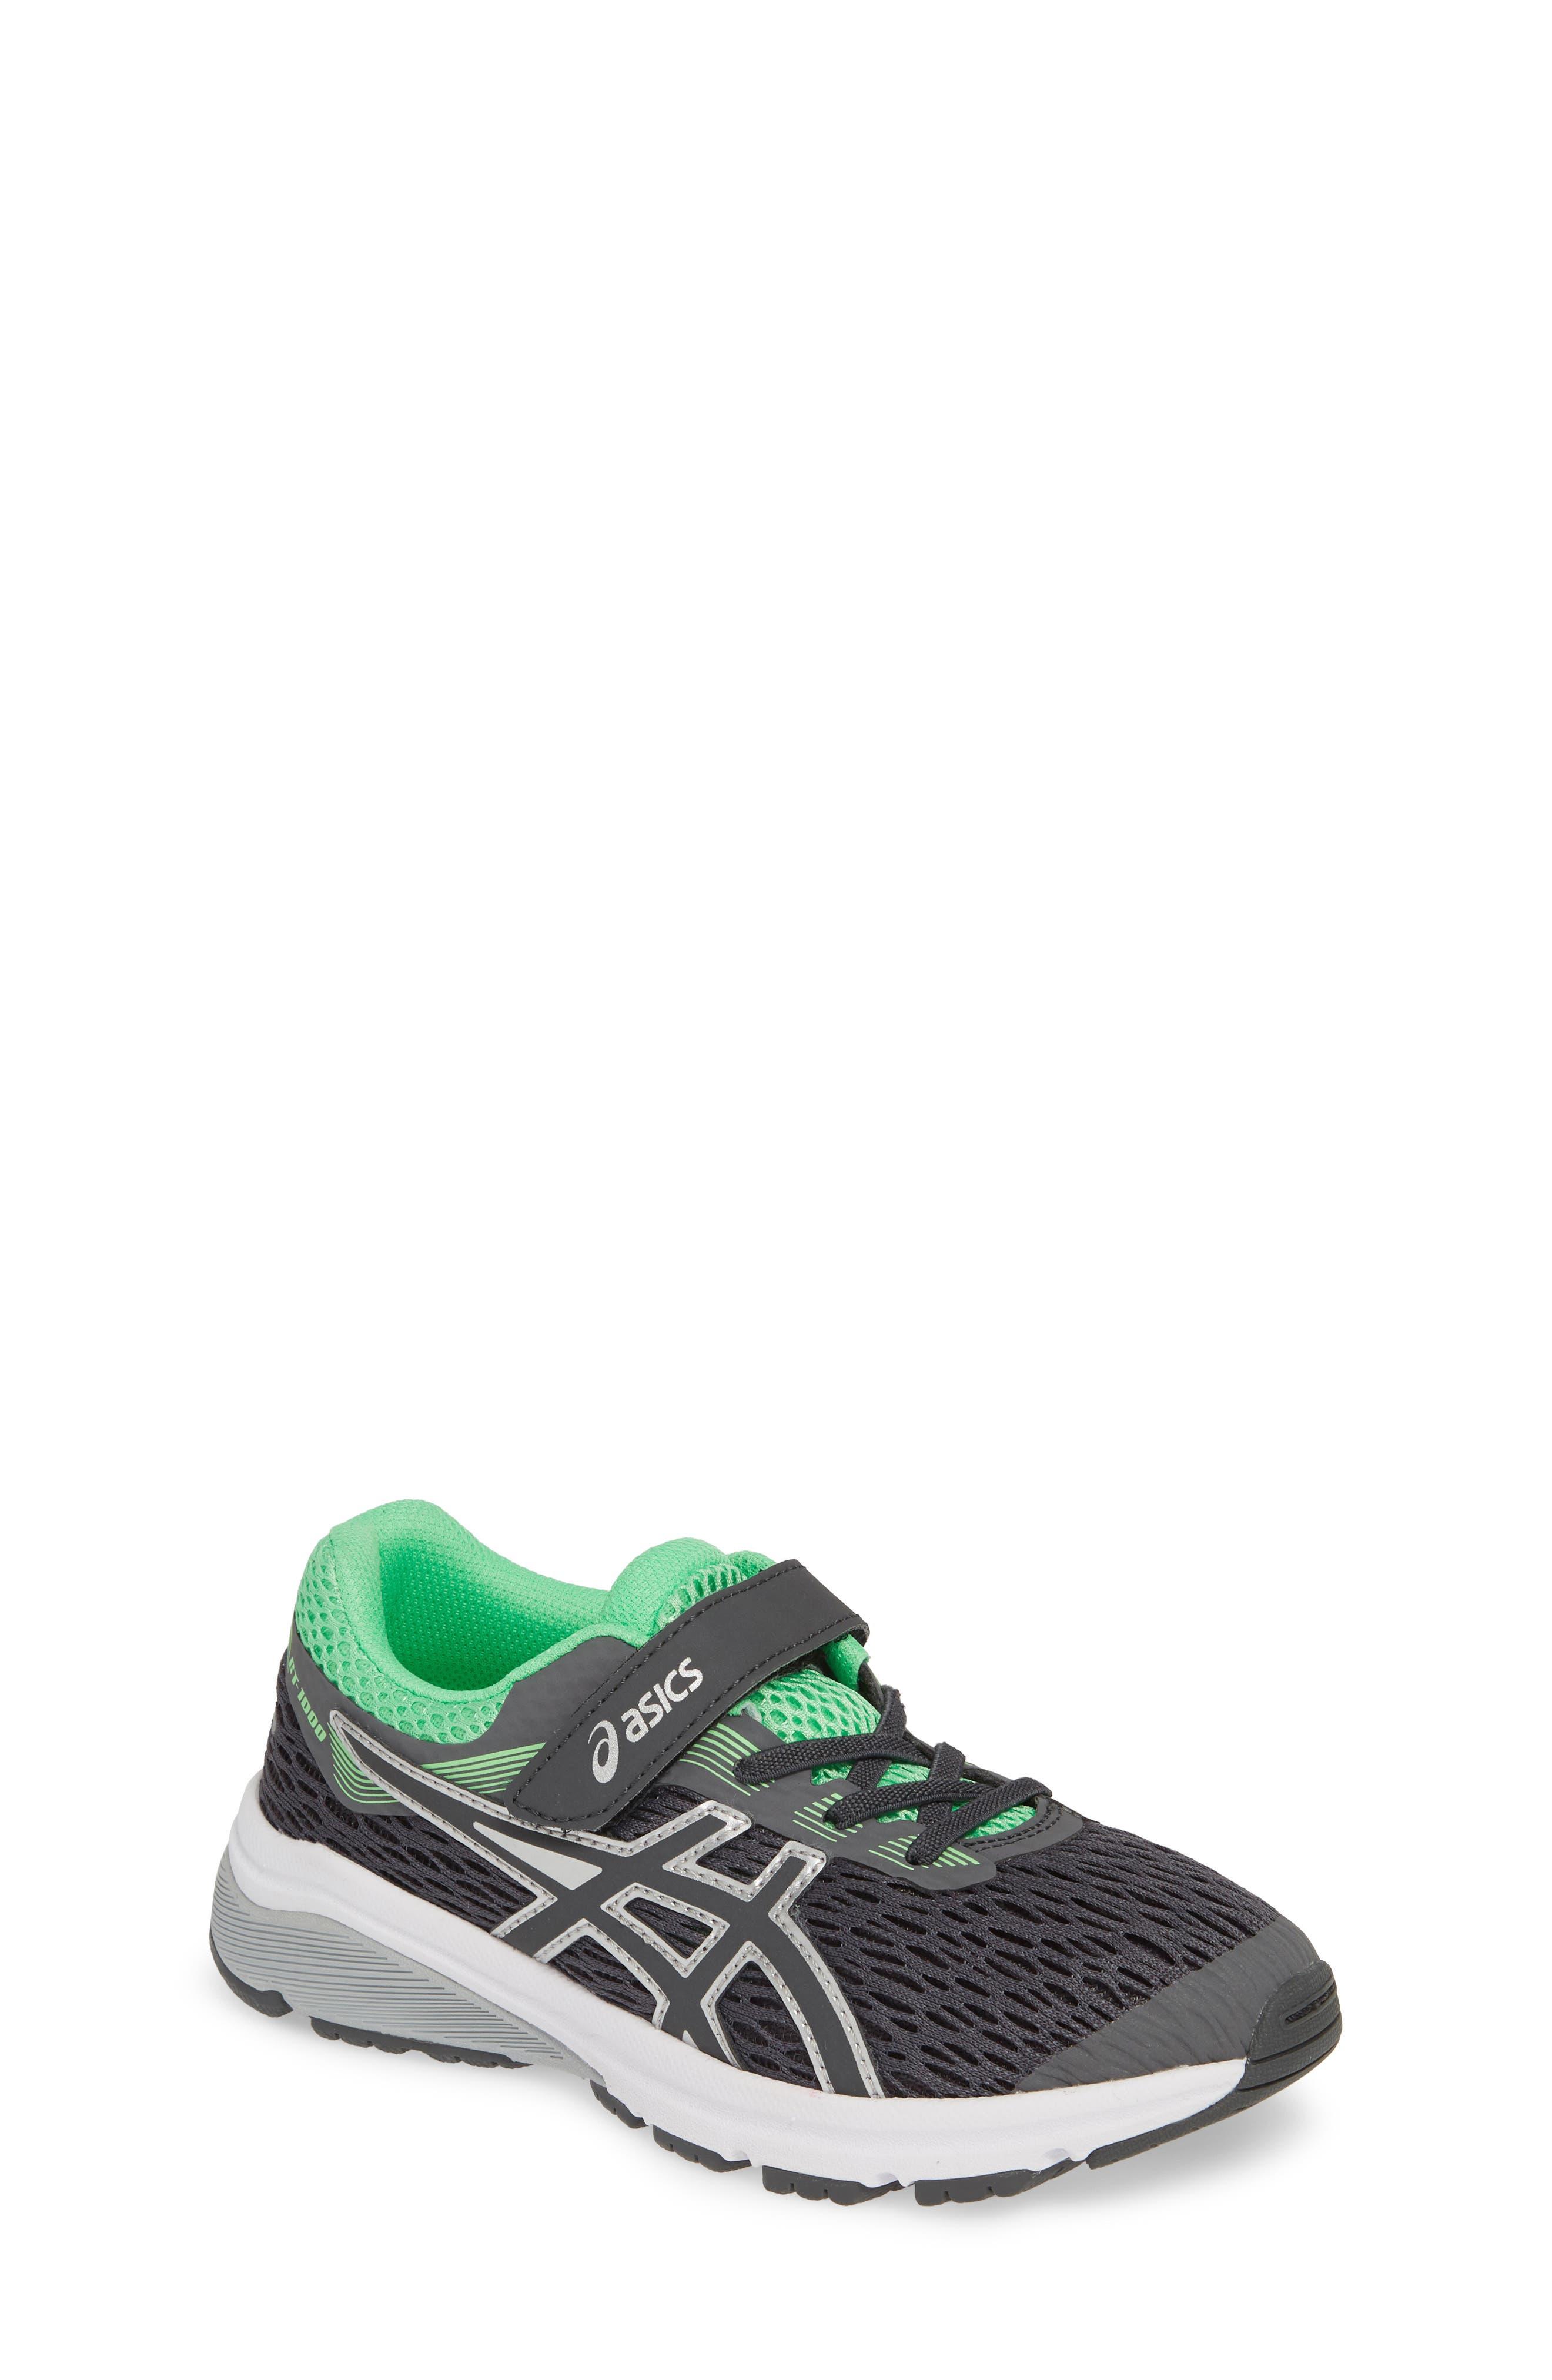 ASICS<SUP>®</SUP> GT 1000 7 Running Shoe, Main, color, DARK GREY/ DARK GREY